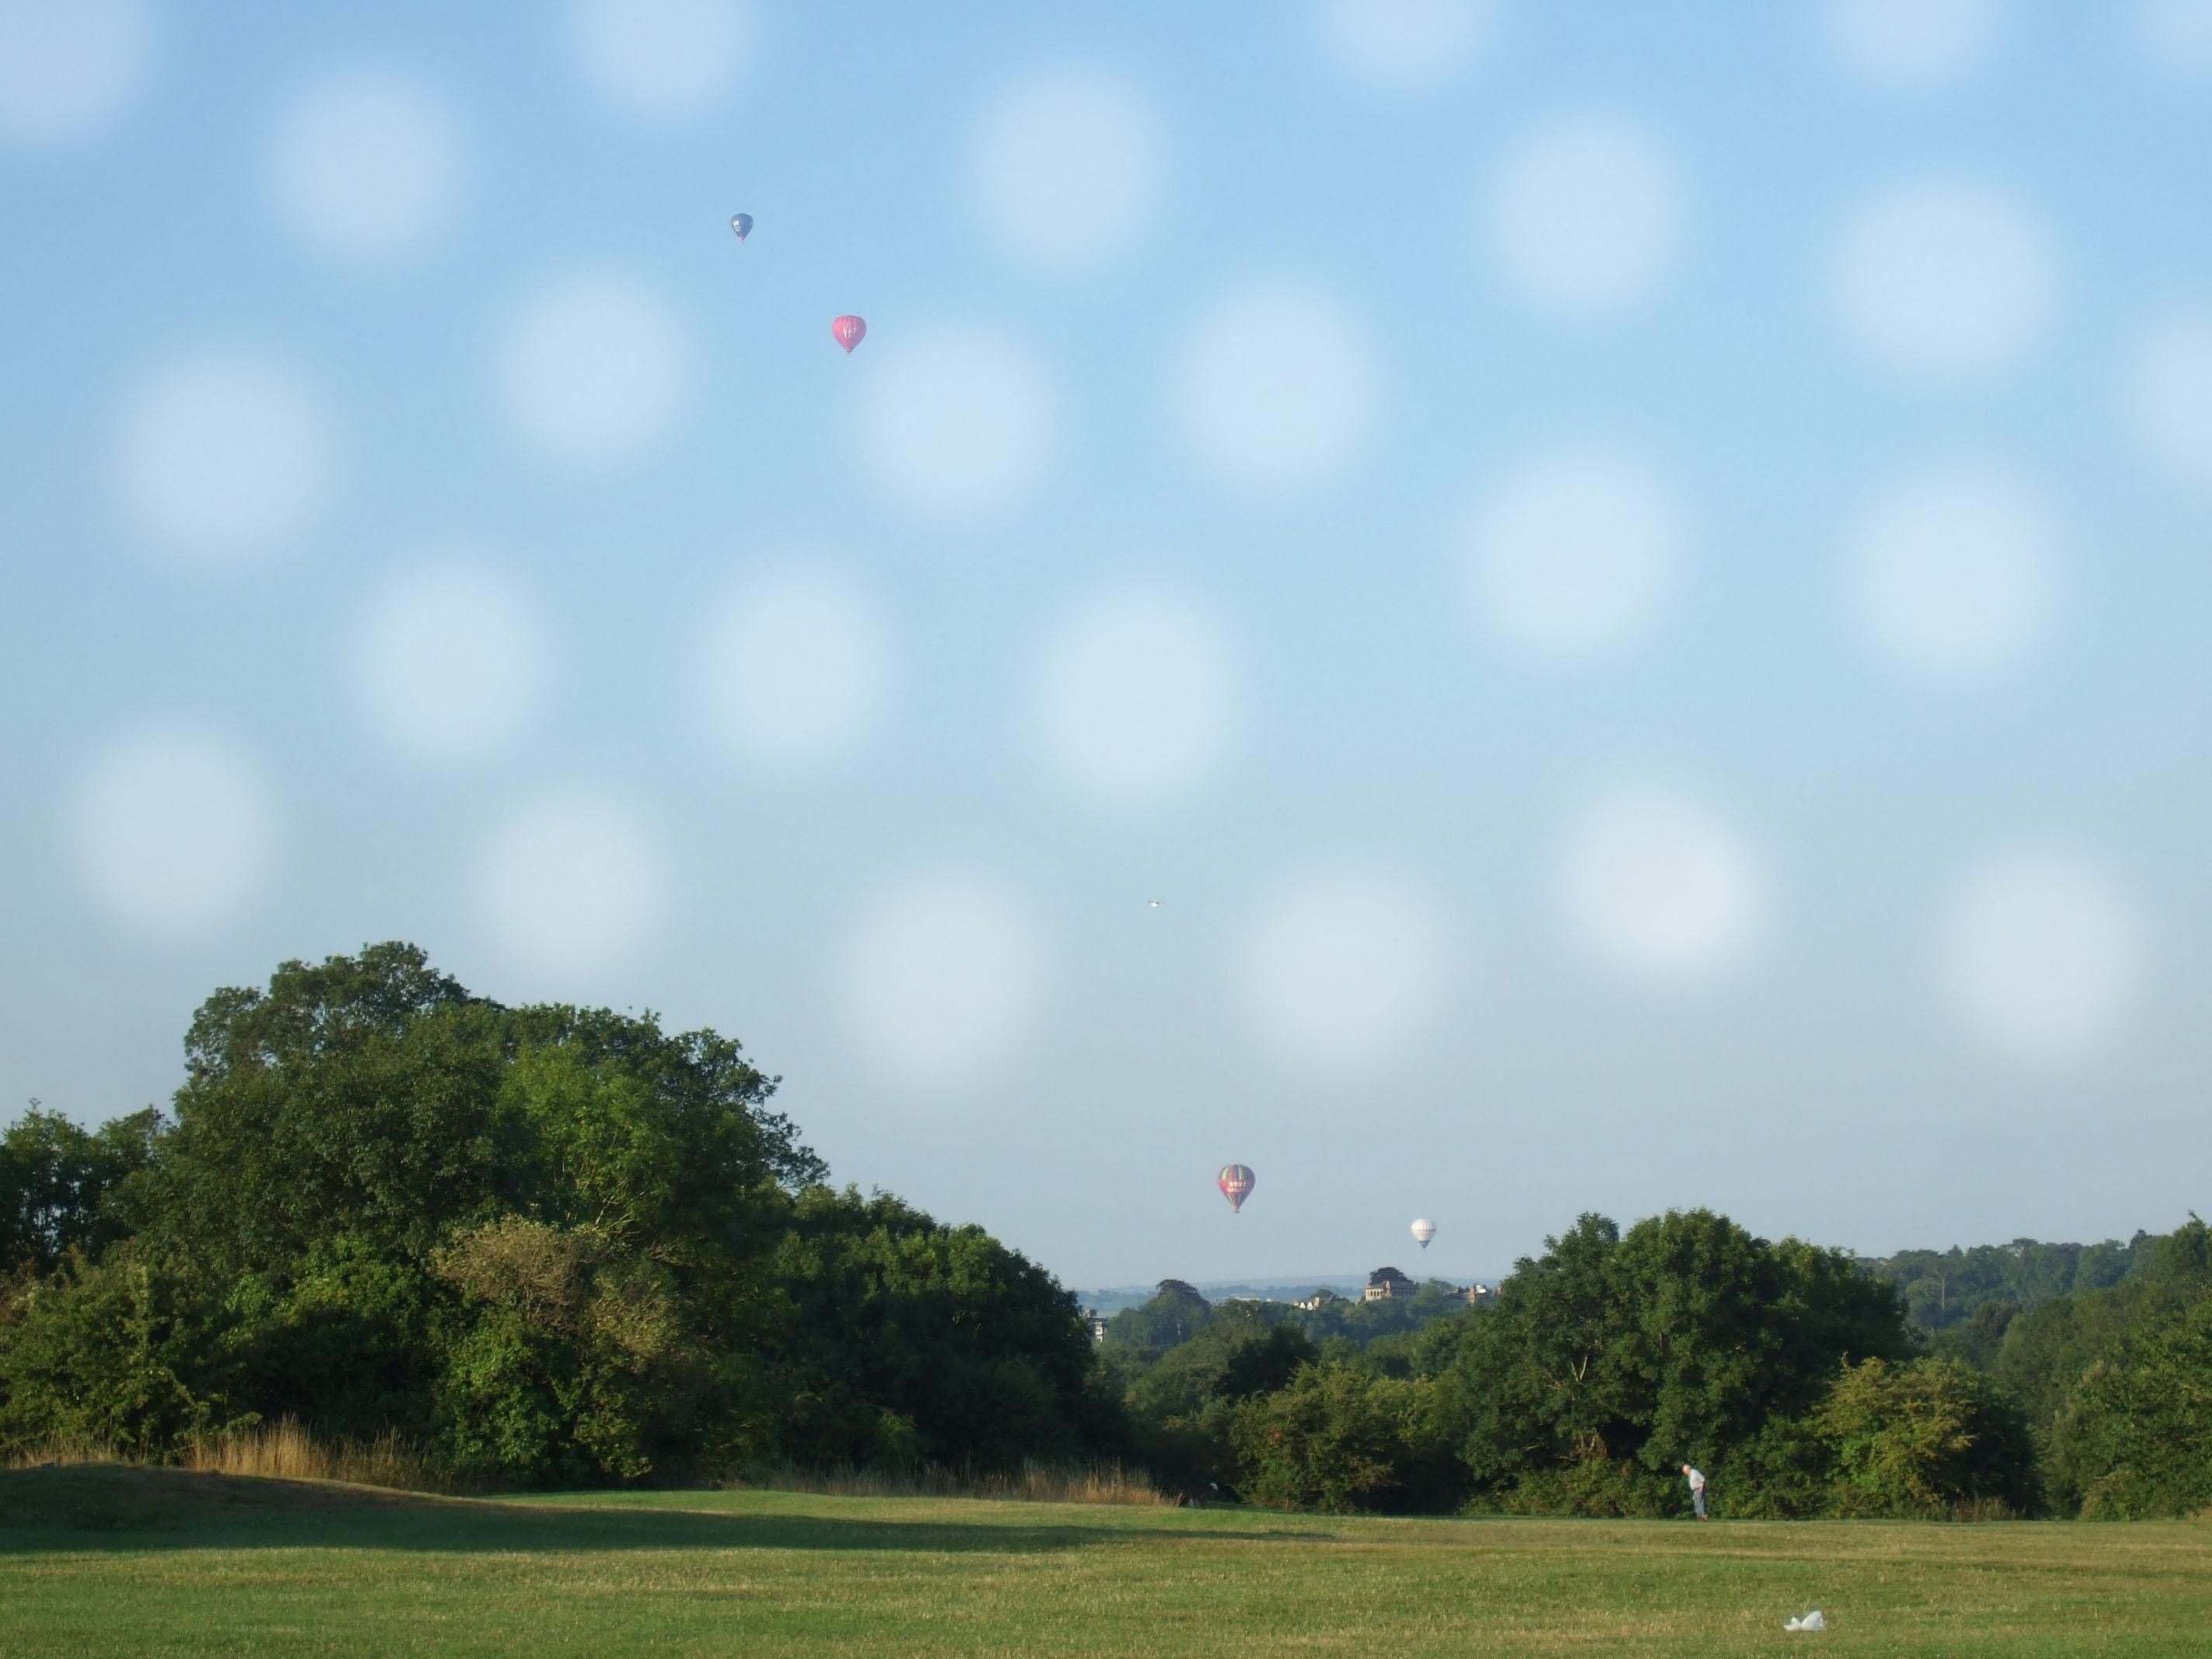 balloon polka dot